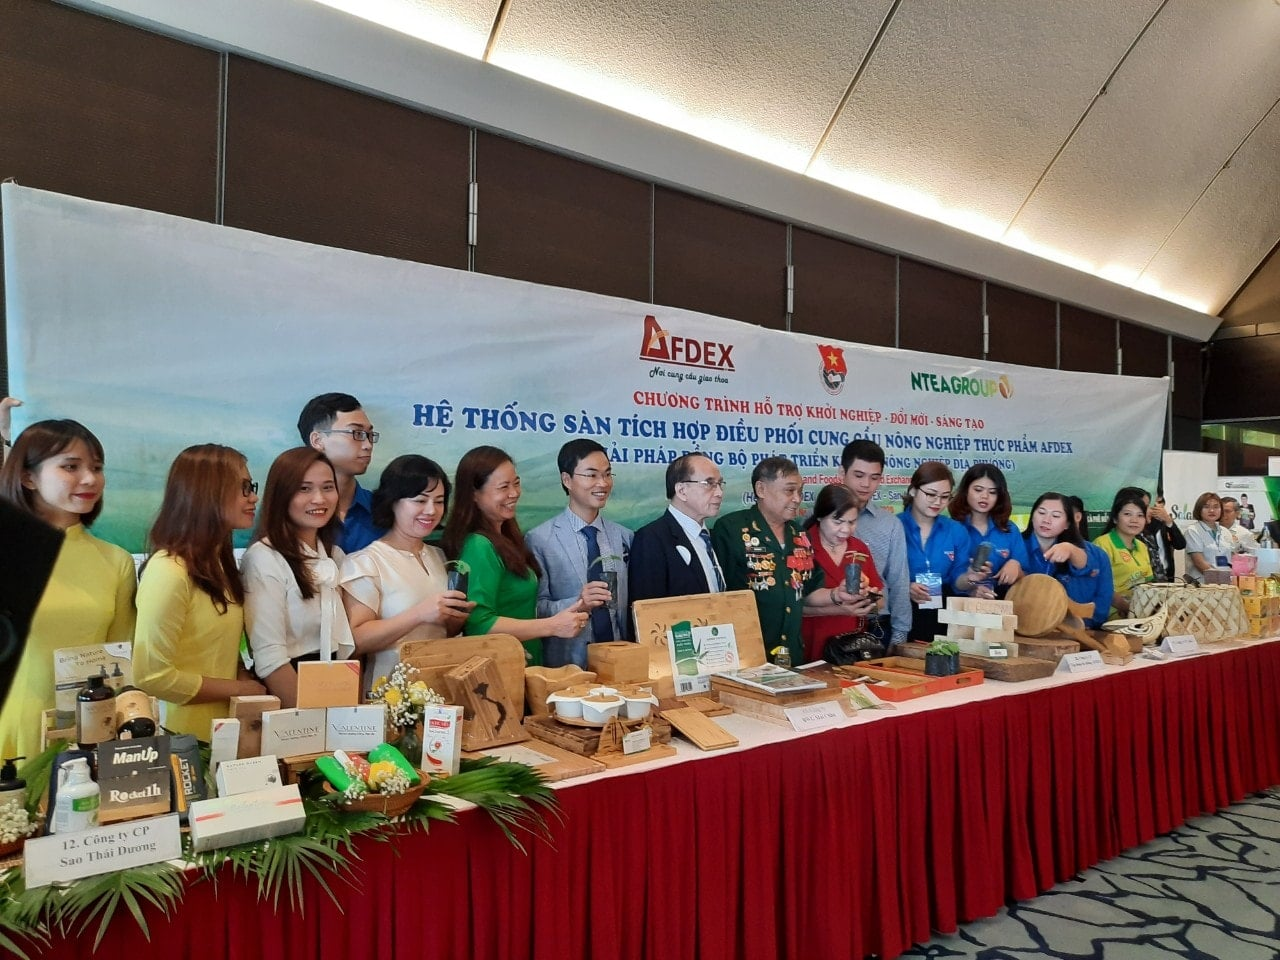 Ntea Việt Nam giới thiệu sản phẩm  tại Vietnam venture summit